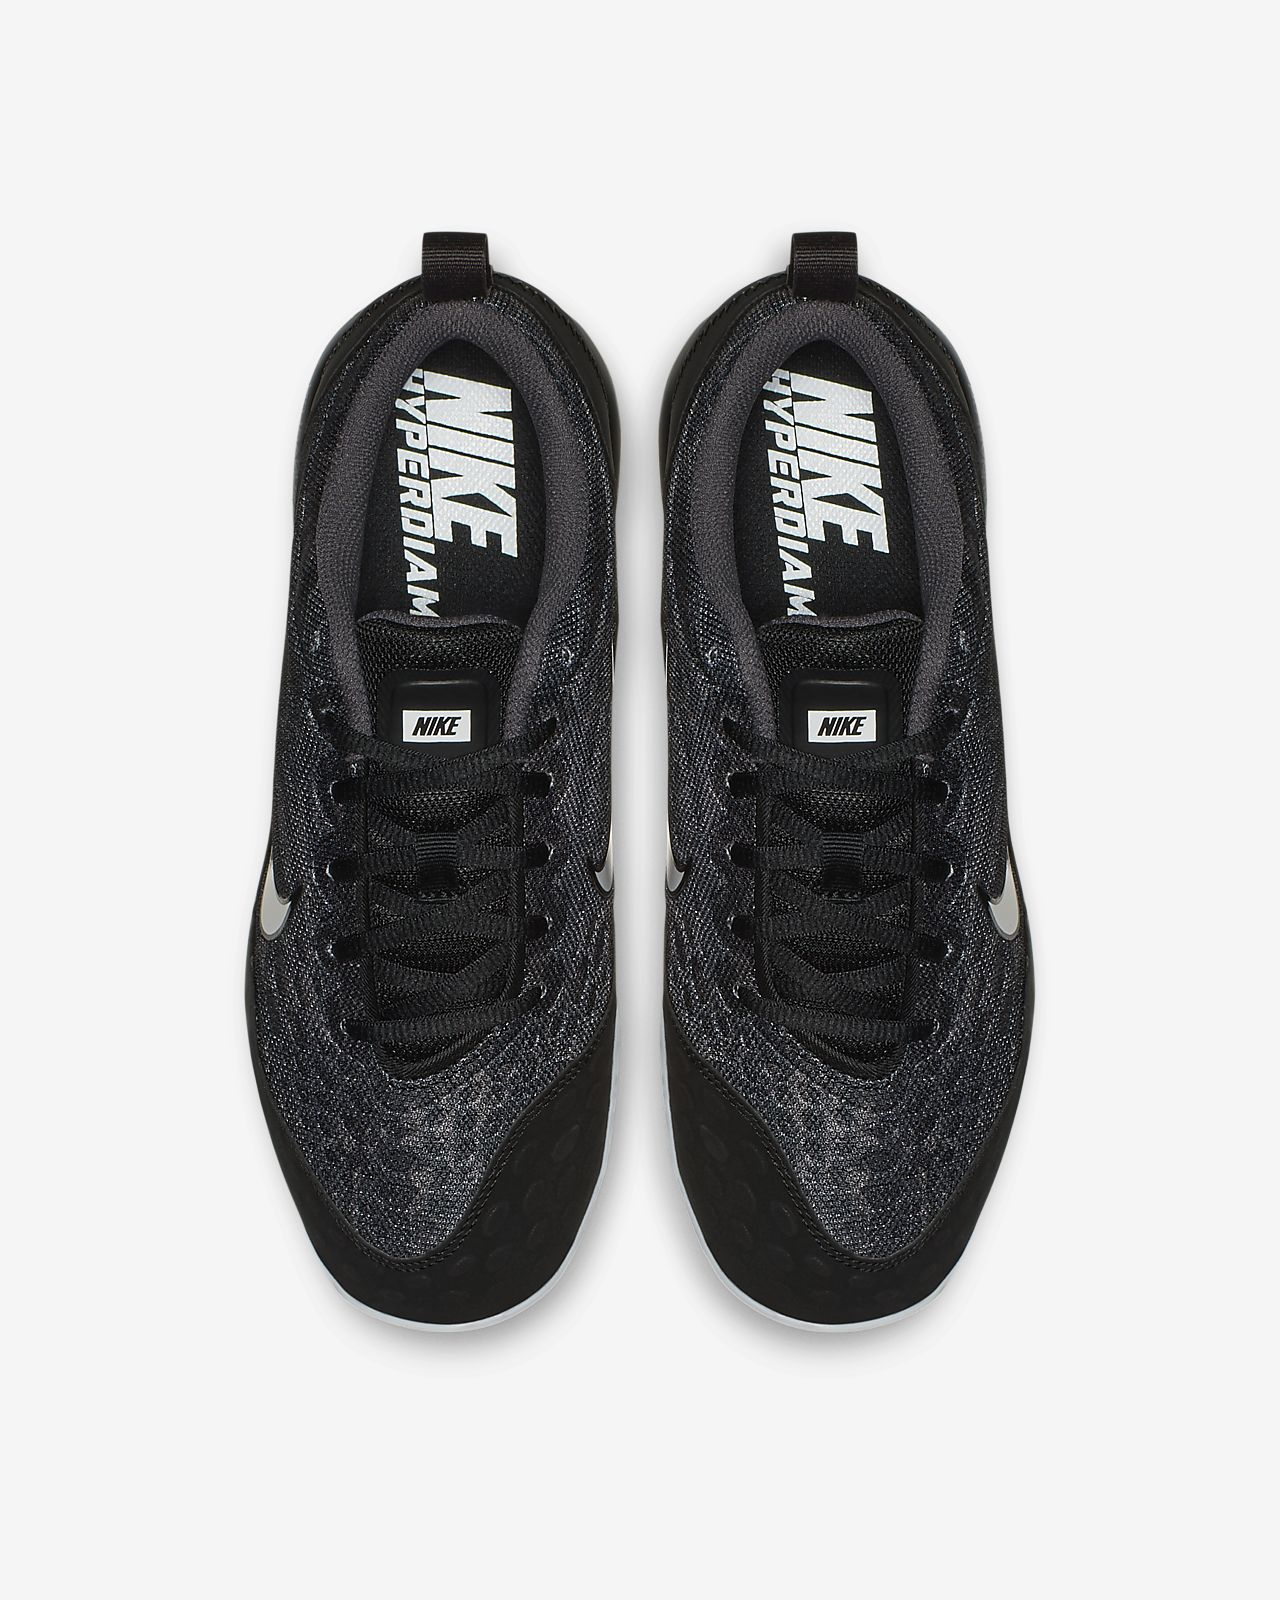 e0a059d45db9 Nike Lunar Hyperdiamond 2 Pro Women s Softball Cleat. Nike.com